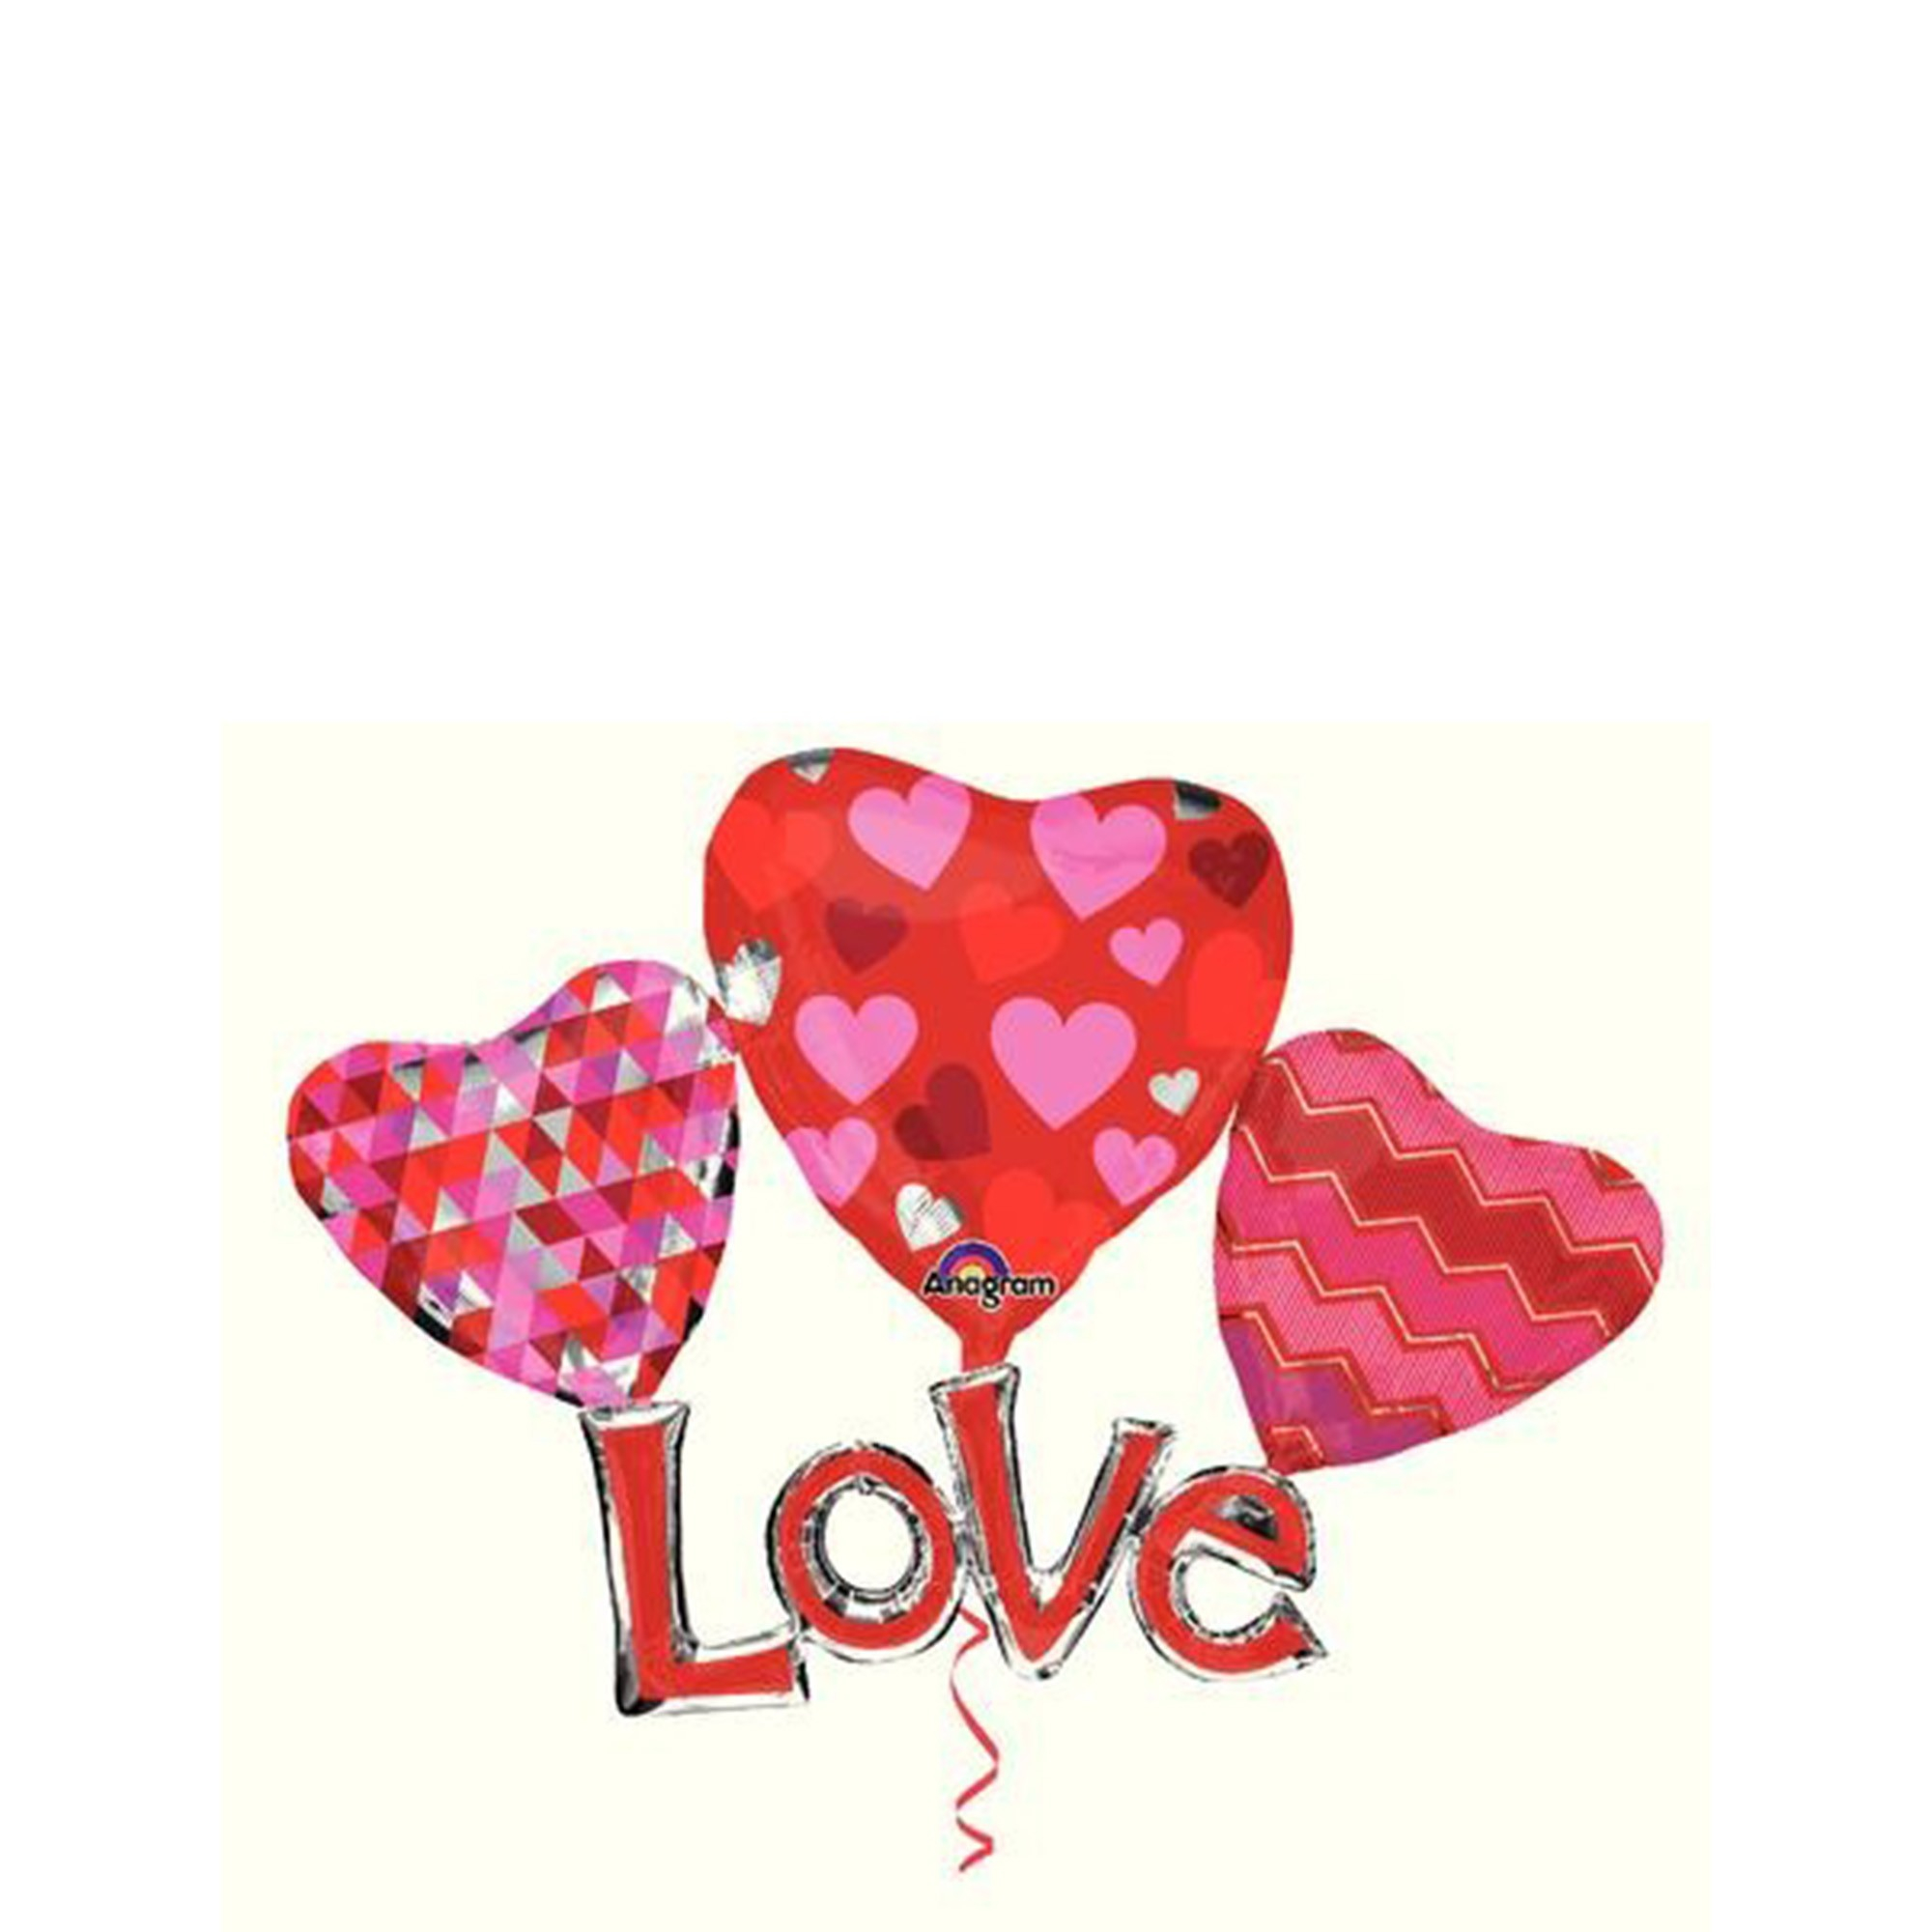 Multi-Balloon Floating Love P80